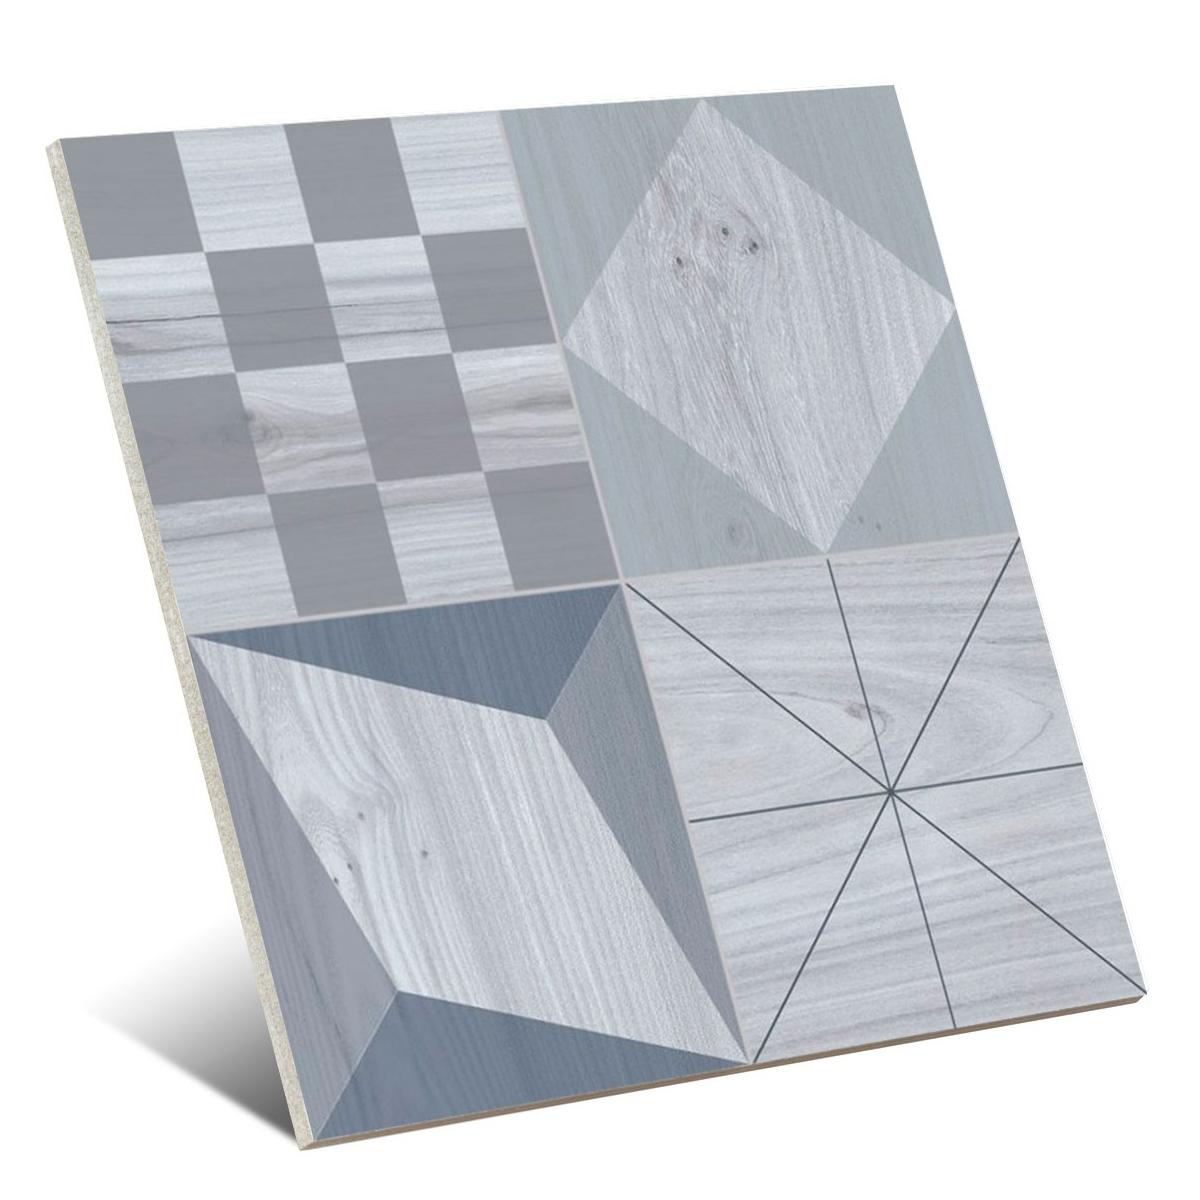 Kaleido gris (caja) - Colección Kaleido de Gaya Fores - Marca Gaya Fores S.L.